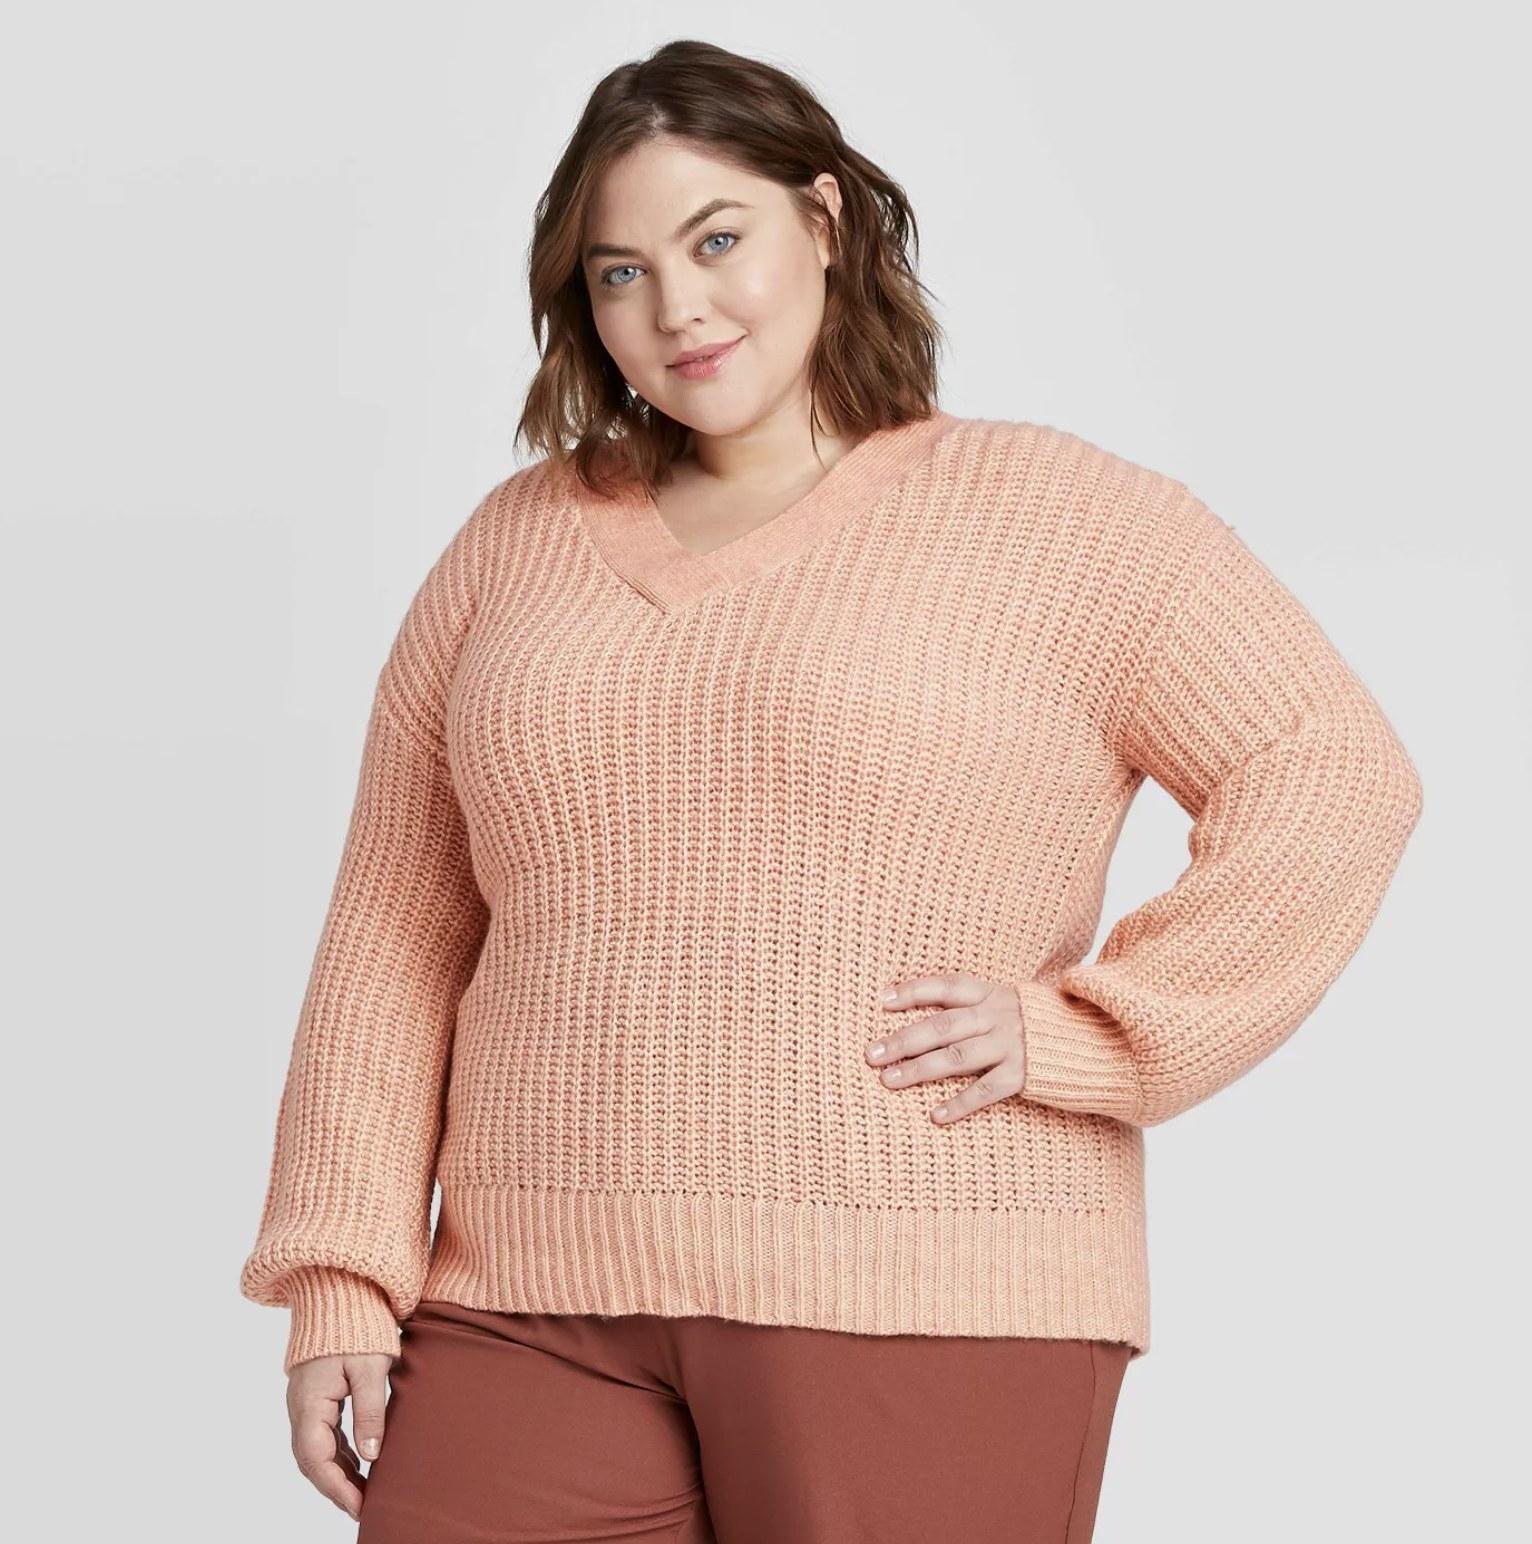 model wearing light pink V-neck sweater